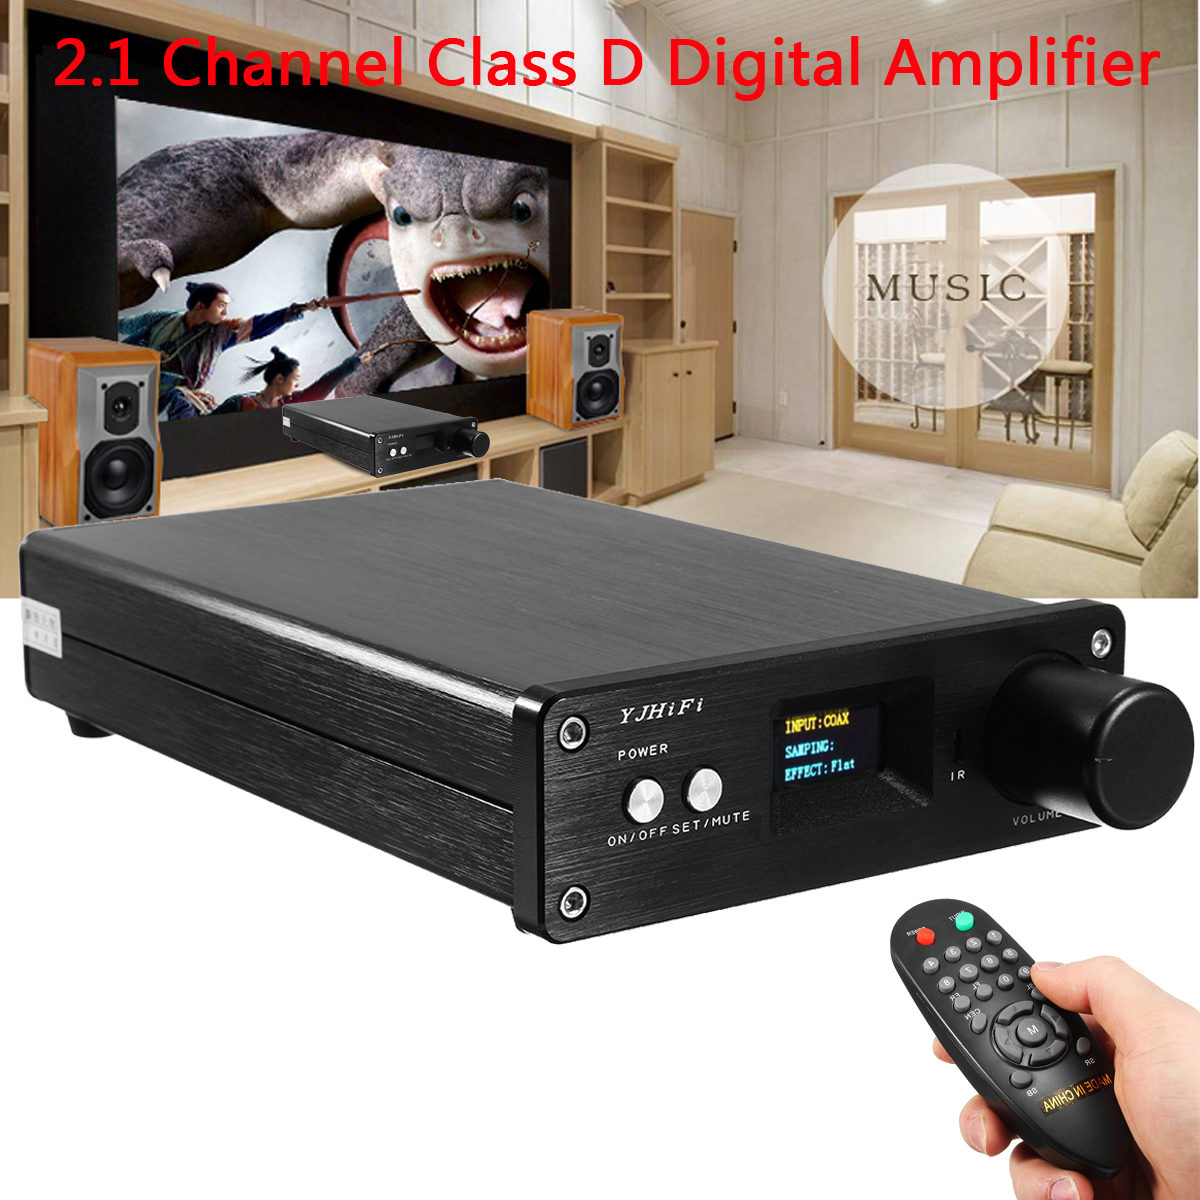 2.1 Channel OLED Digital Stereo Home Audio Power Amplifier MINI Class D 50W+50W HIFI Amplifier USB Optical Fiber Coaxial Input dc24v 50w 50w tda7492 bluetooth fiber coaxial dac decoder amplifier with usb input amplifier